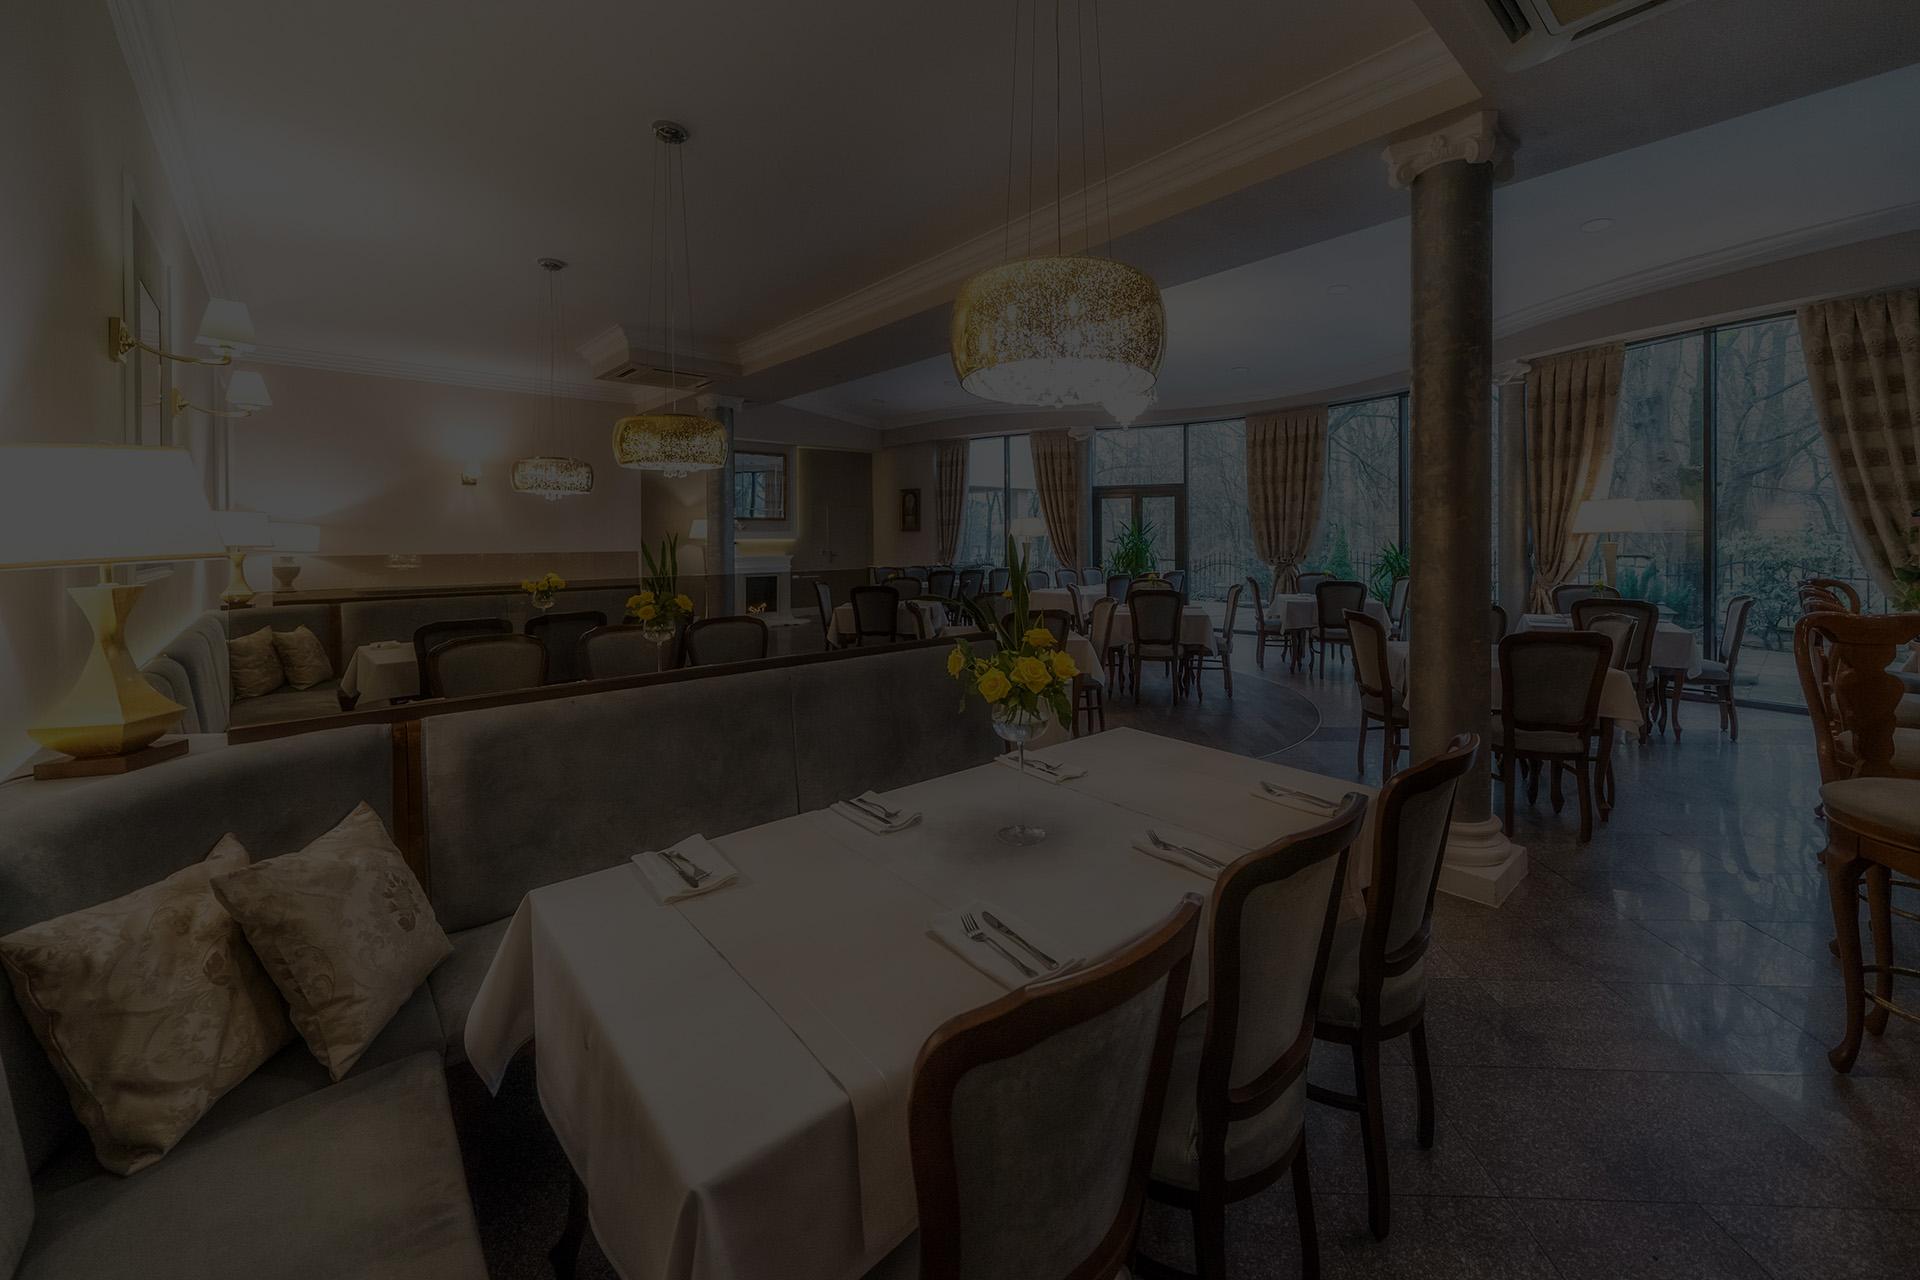 Skawina Aria Restauracja